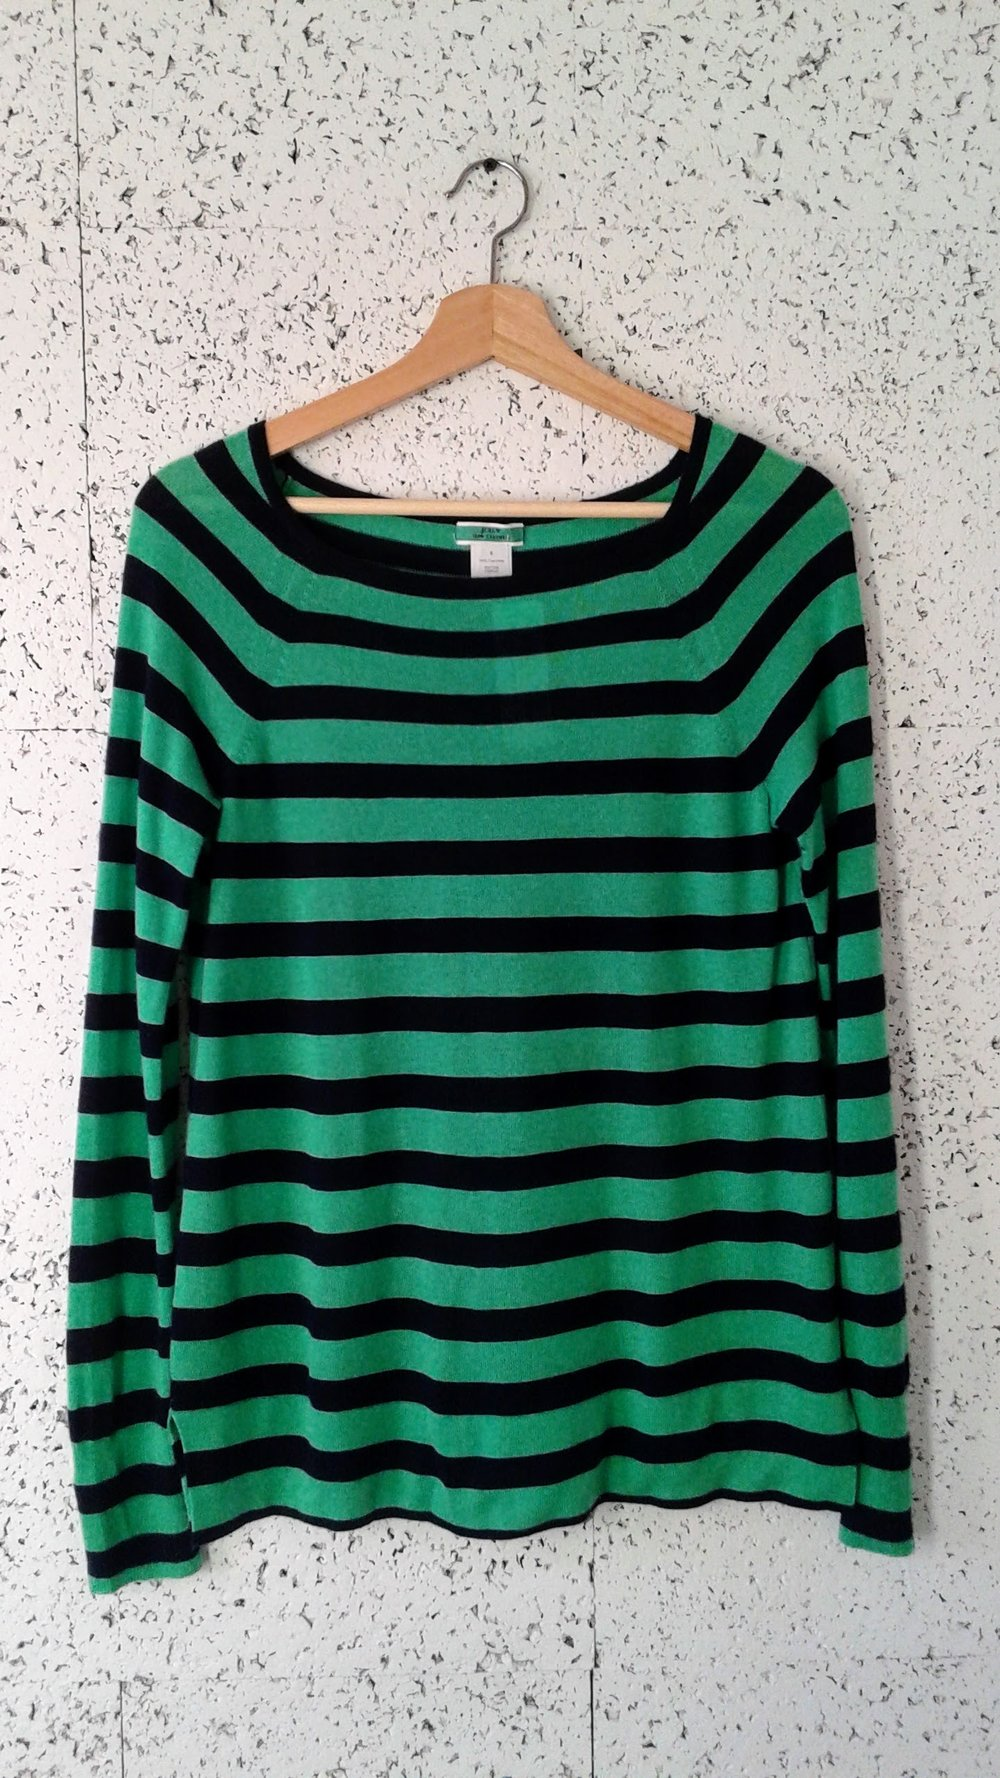 J Crew sweater; Size S, $42